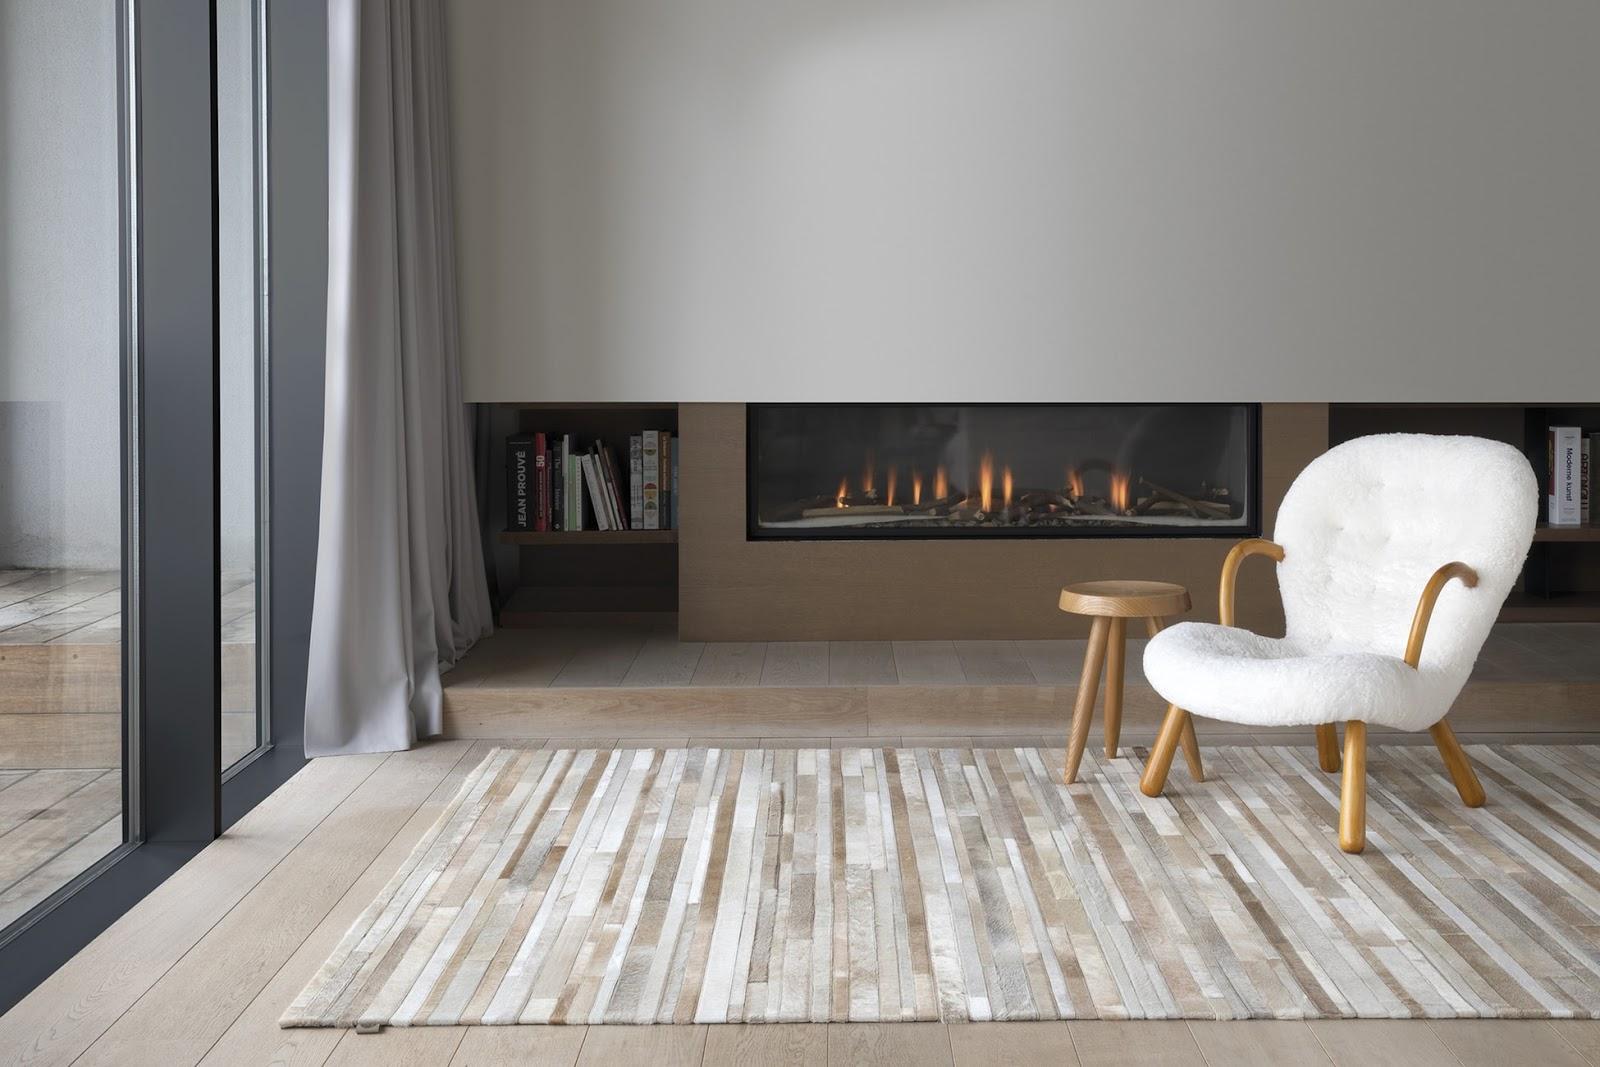 vloerverwarming tapijt